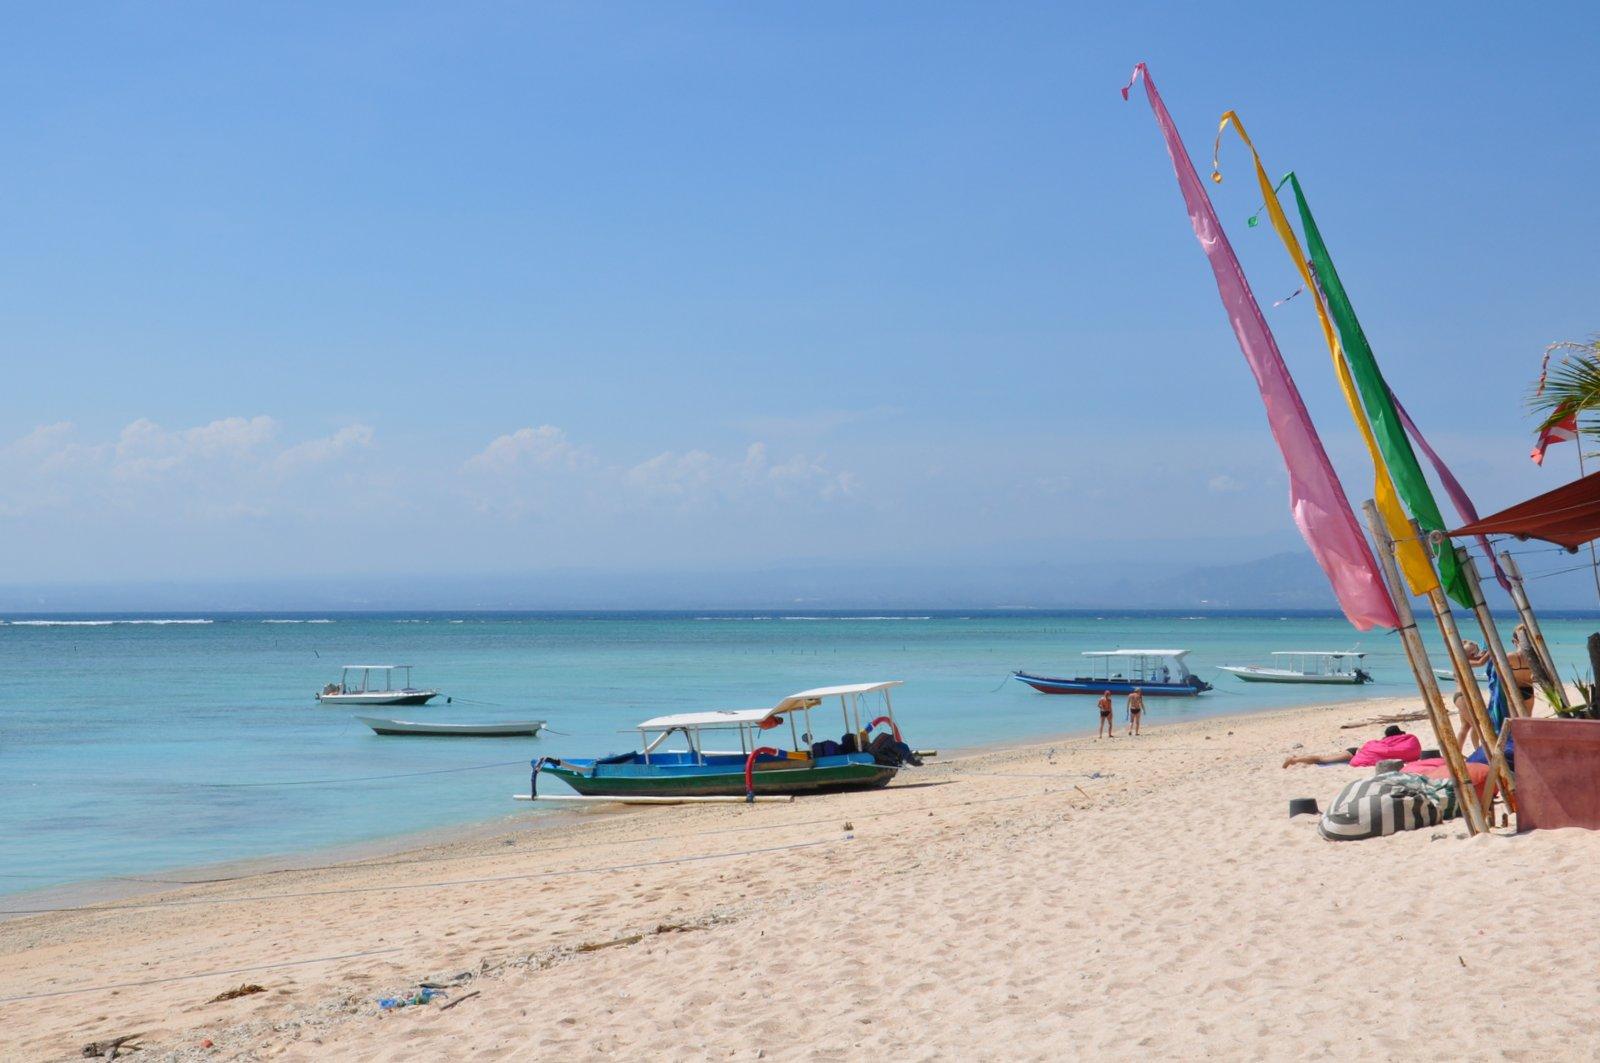 La plage de Jungutbatu à Nusa Lembongan